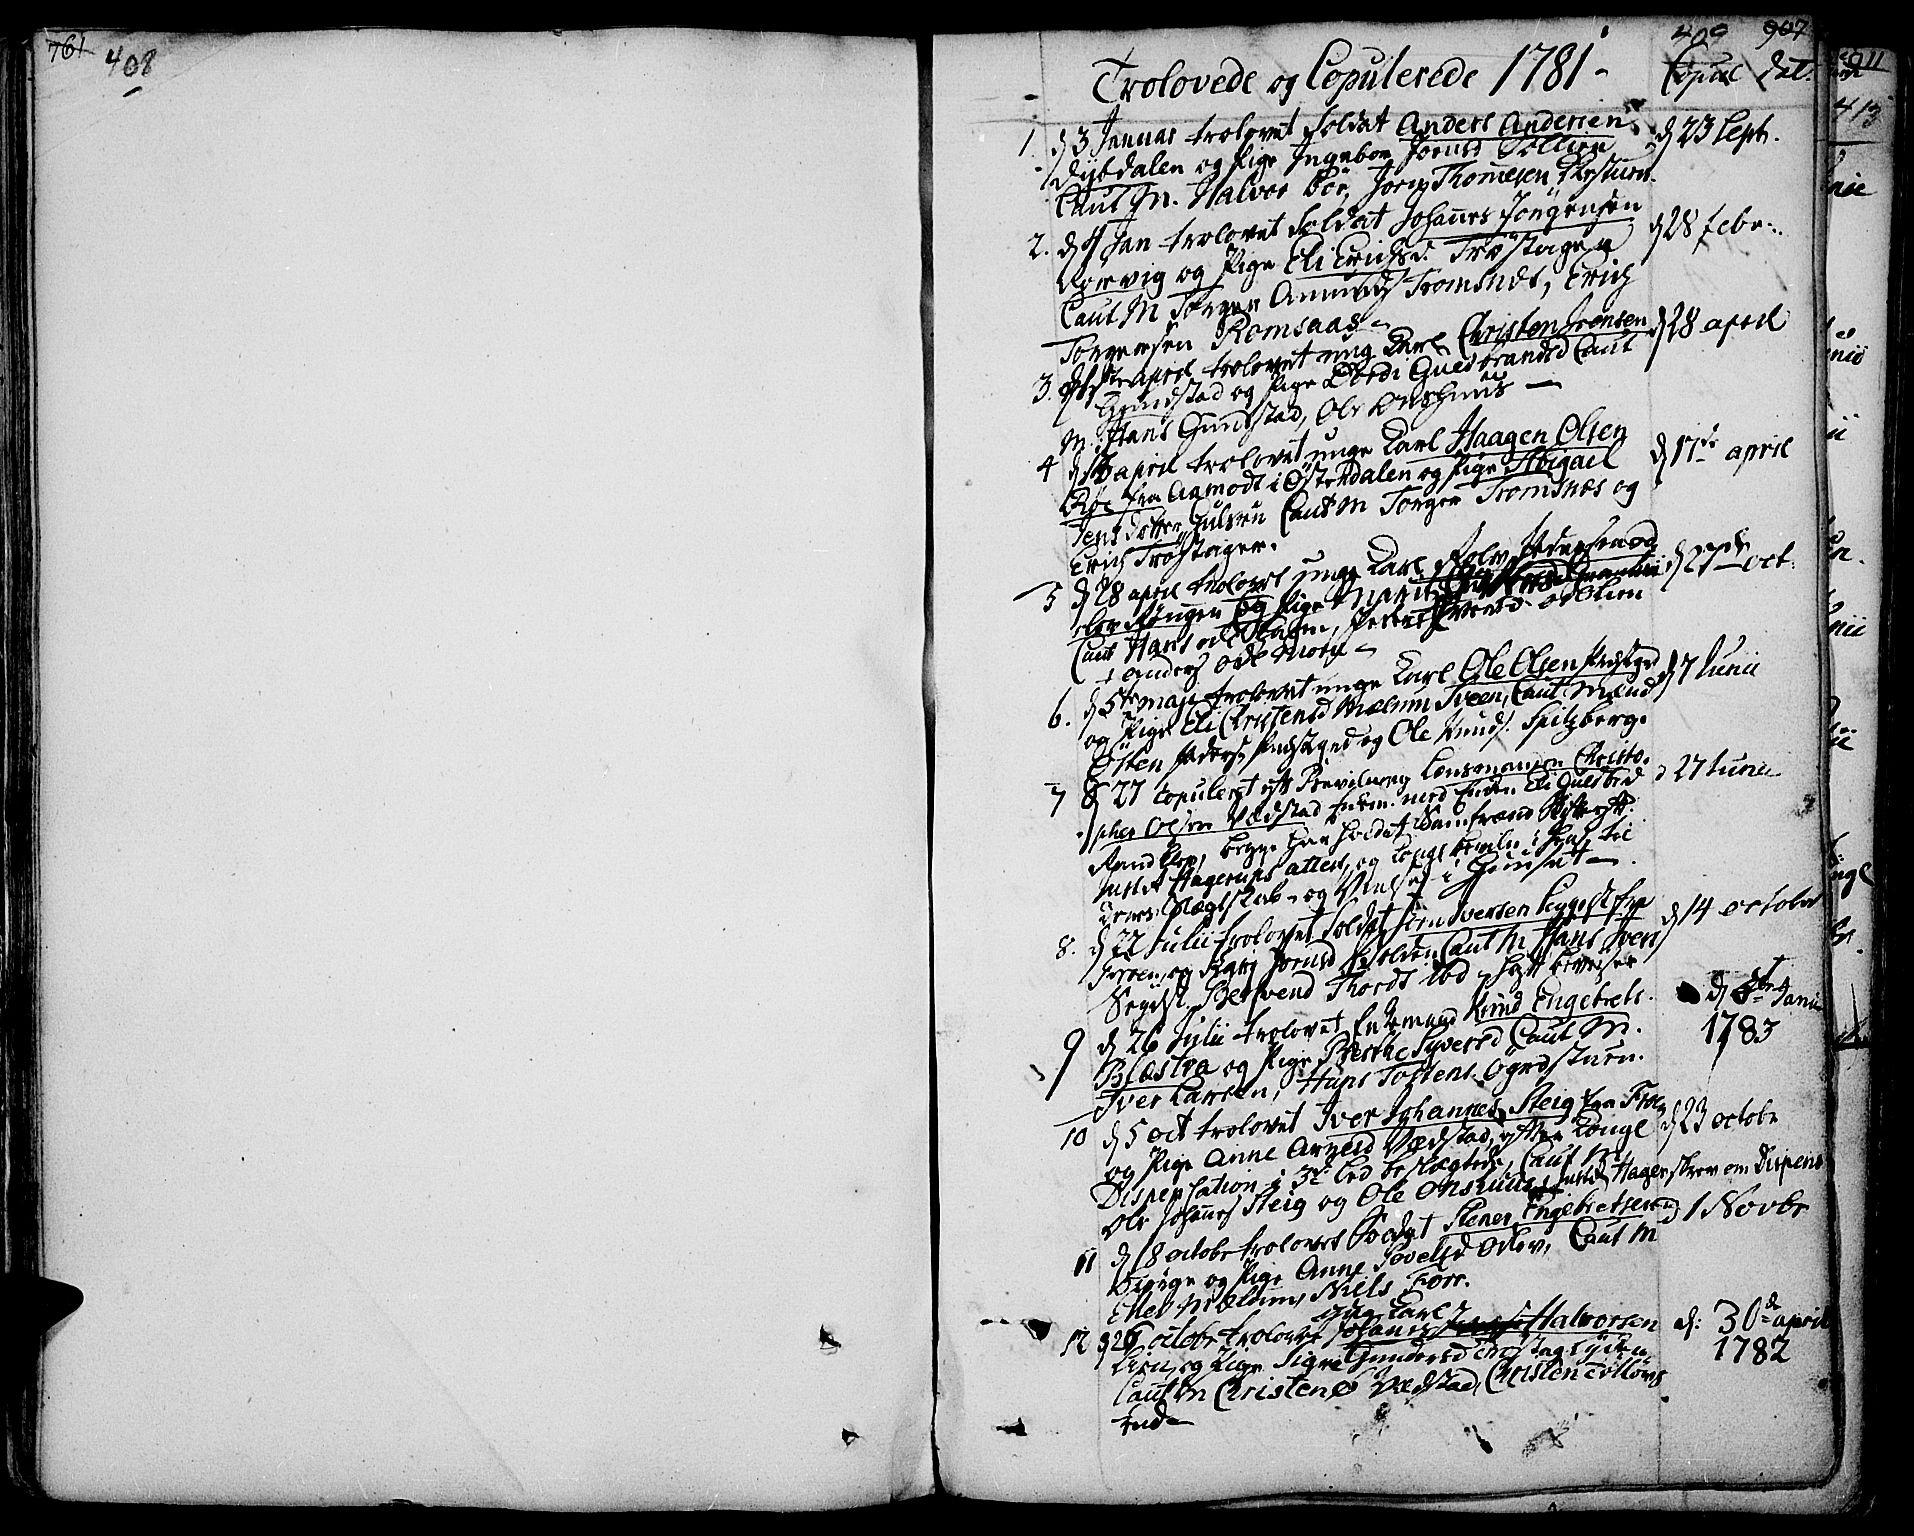 SAH, Ringebu prestekontor, Ministerialbok nr. 3, 1781-1820, s. 408-409